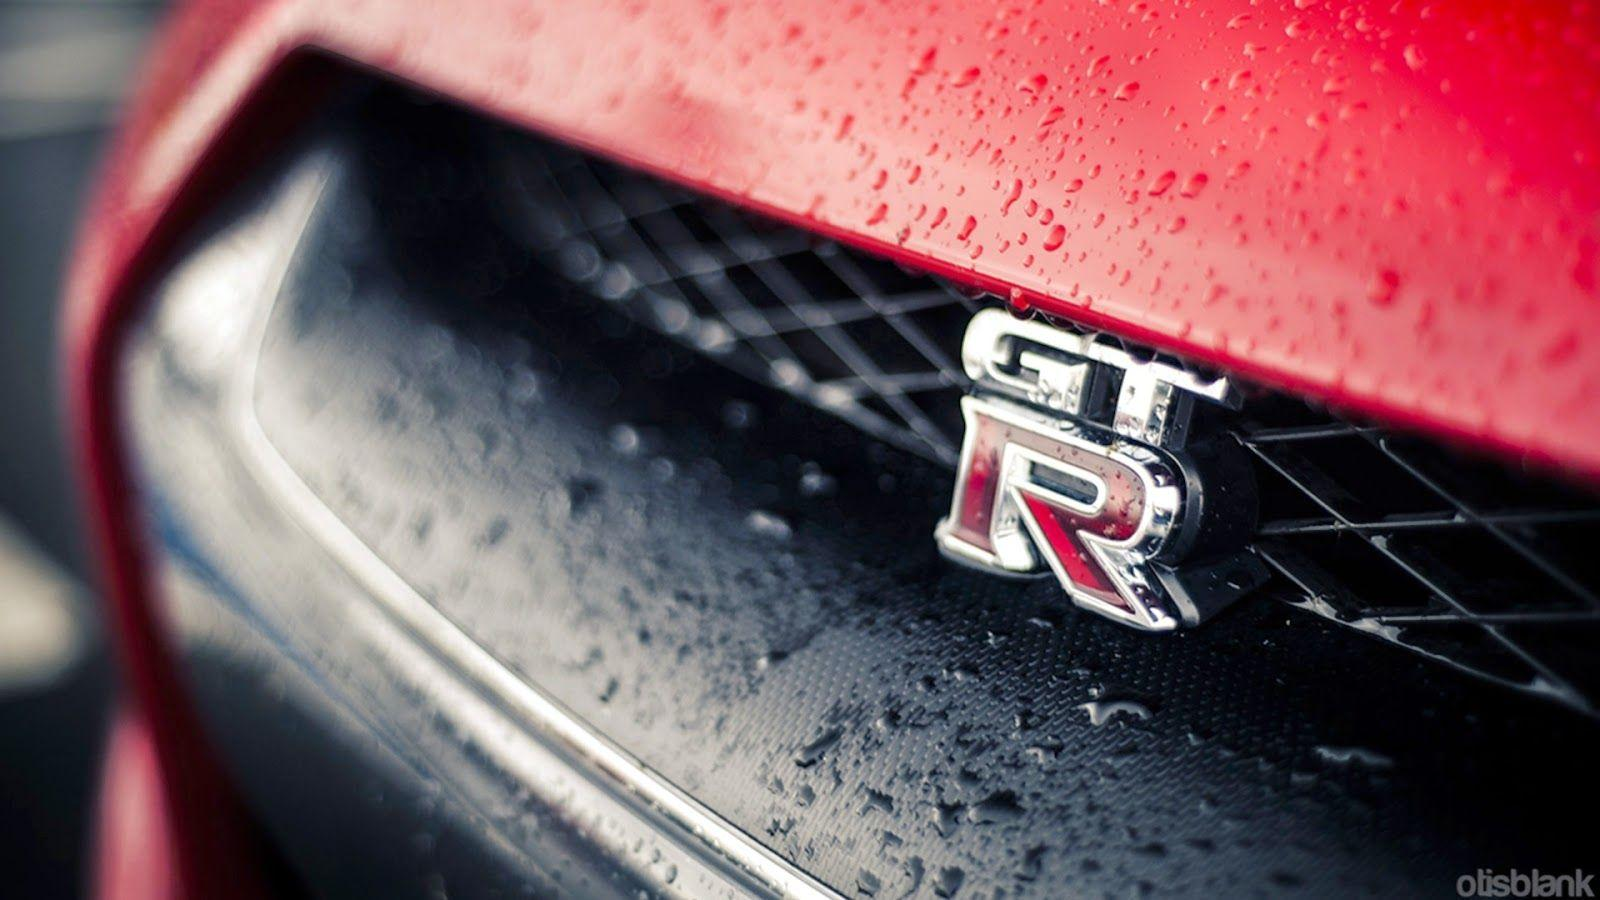 Nissan GTR - wallpaper hd | HD Wallpaper with cars - JokerCars ...